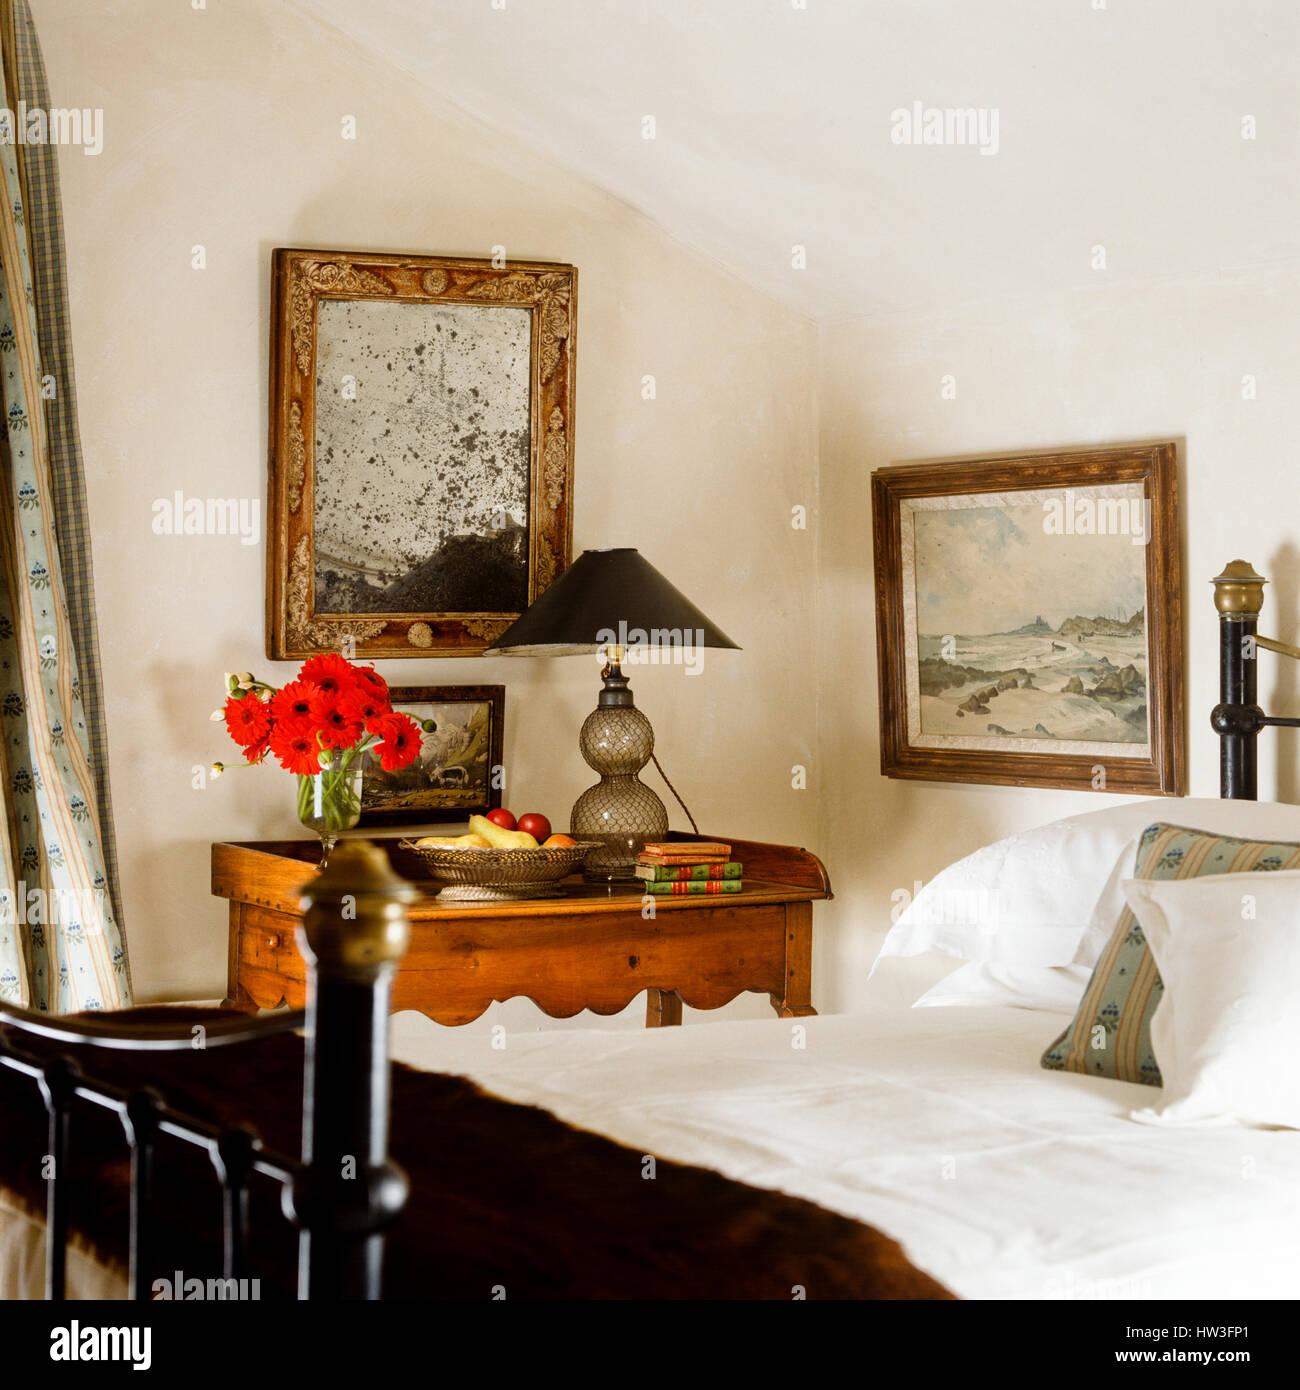 Rustikale Schlafzimmer Stockfoto, Bild: 135917209 - Alamy